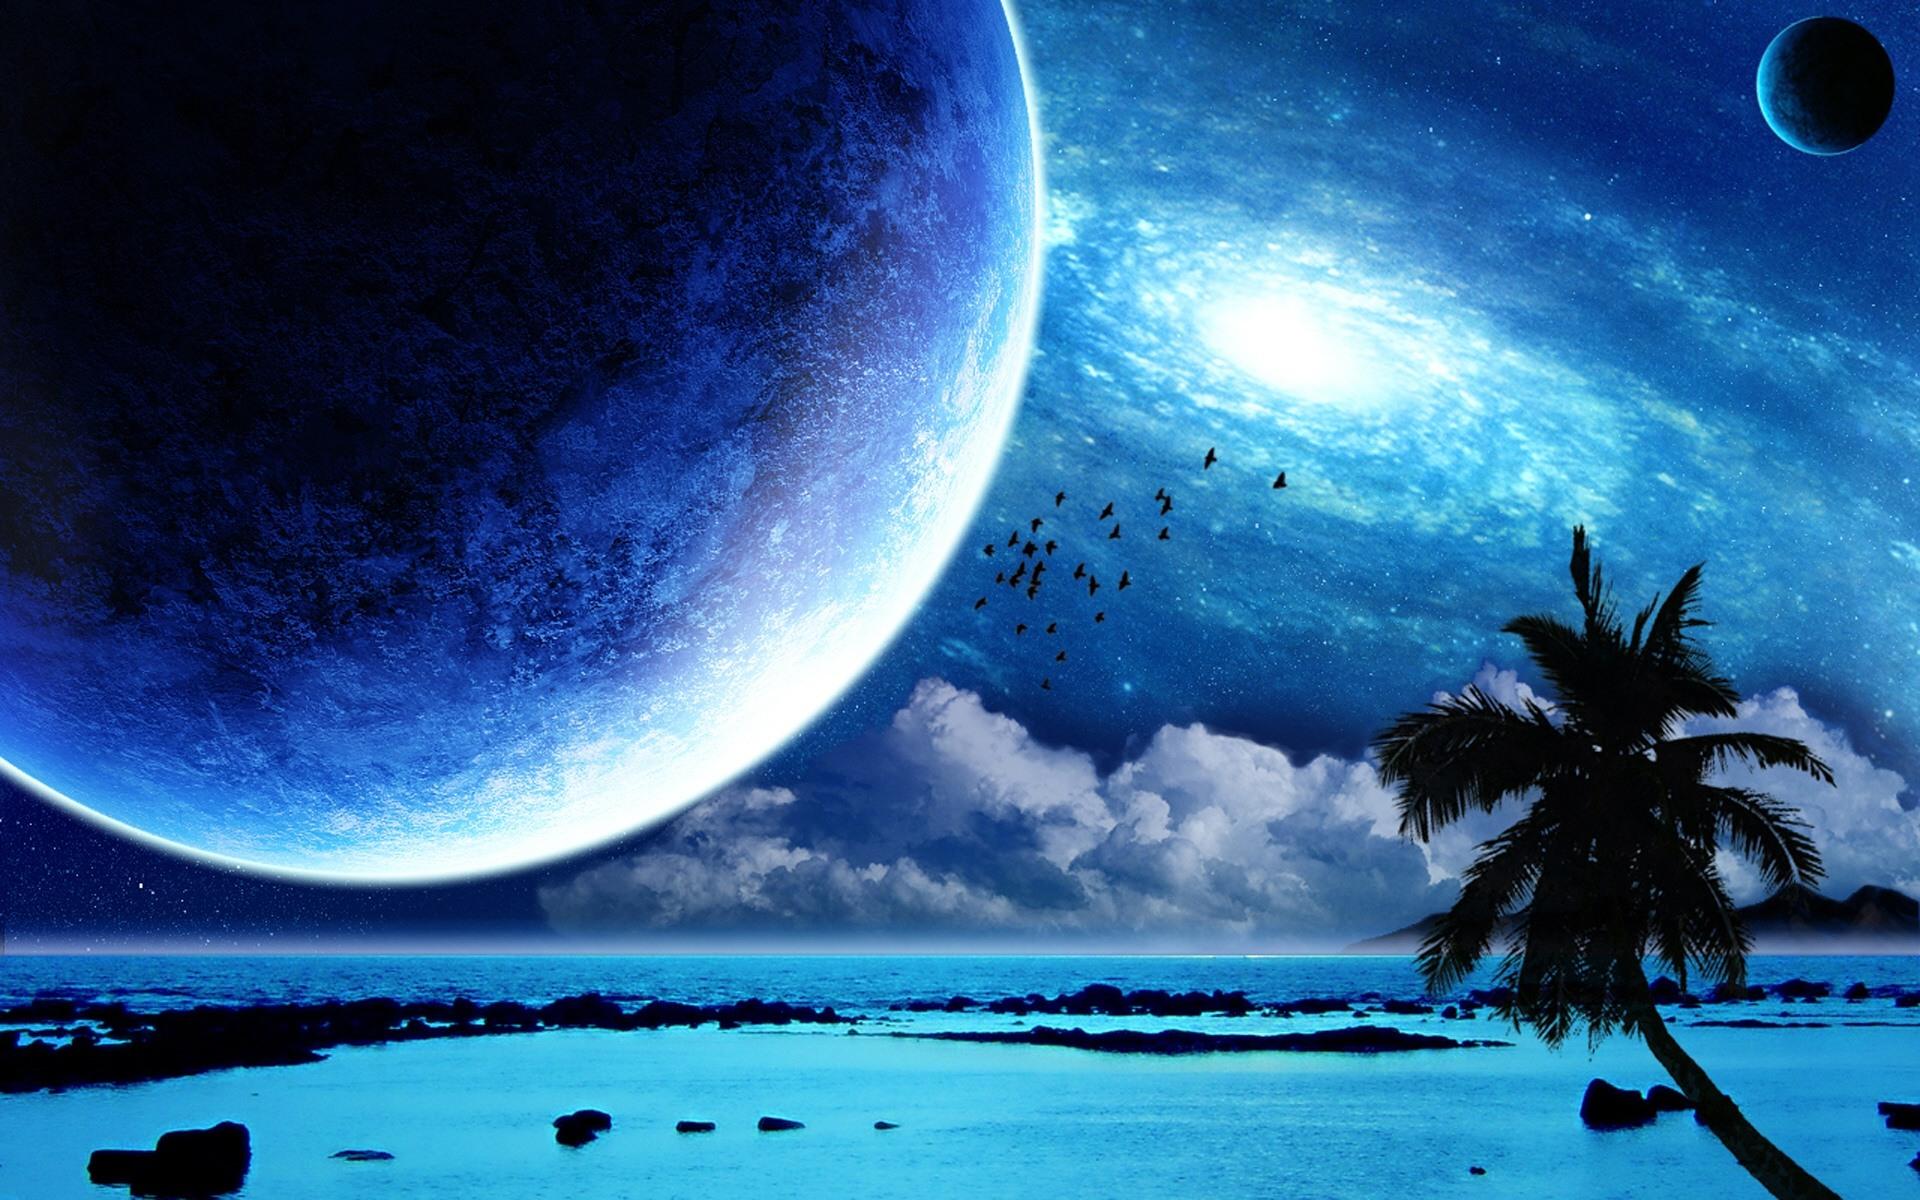 tropical desktop wallpaper island desktopia bazzza interstellar 1920x1200